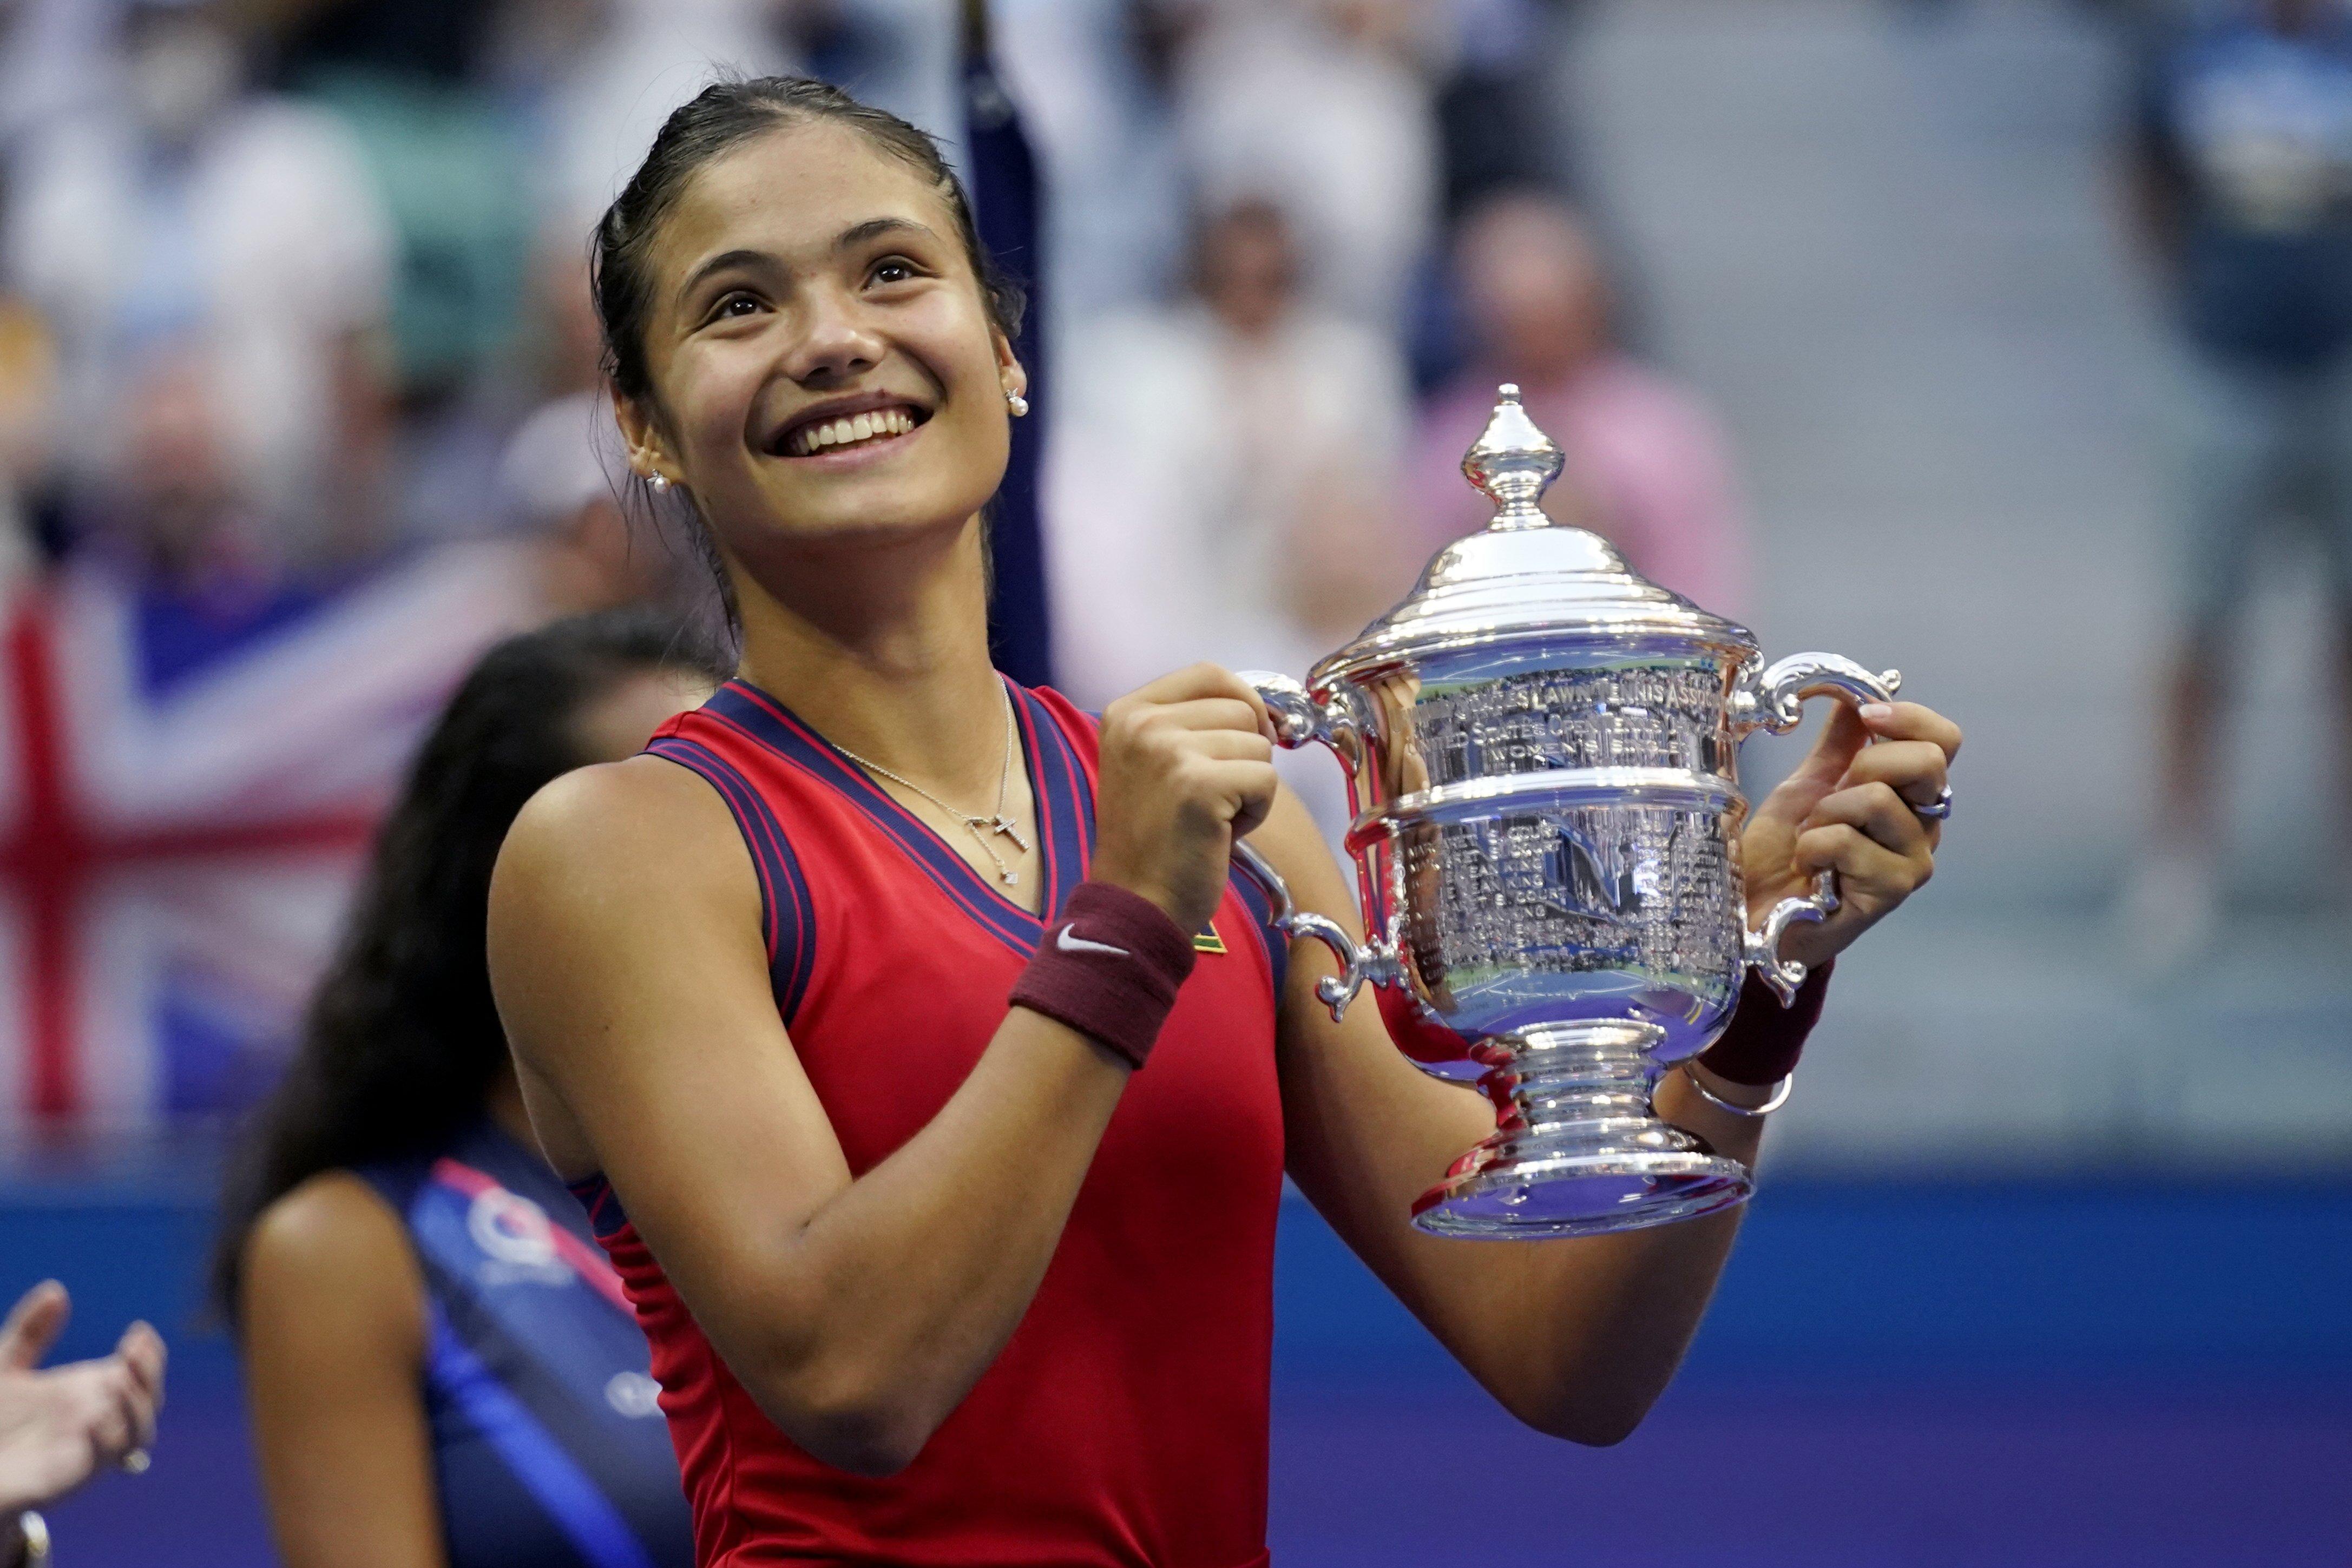 Britain's Emma Raducanu beats Leyla Fernandez in all-teen U.S. Open final